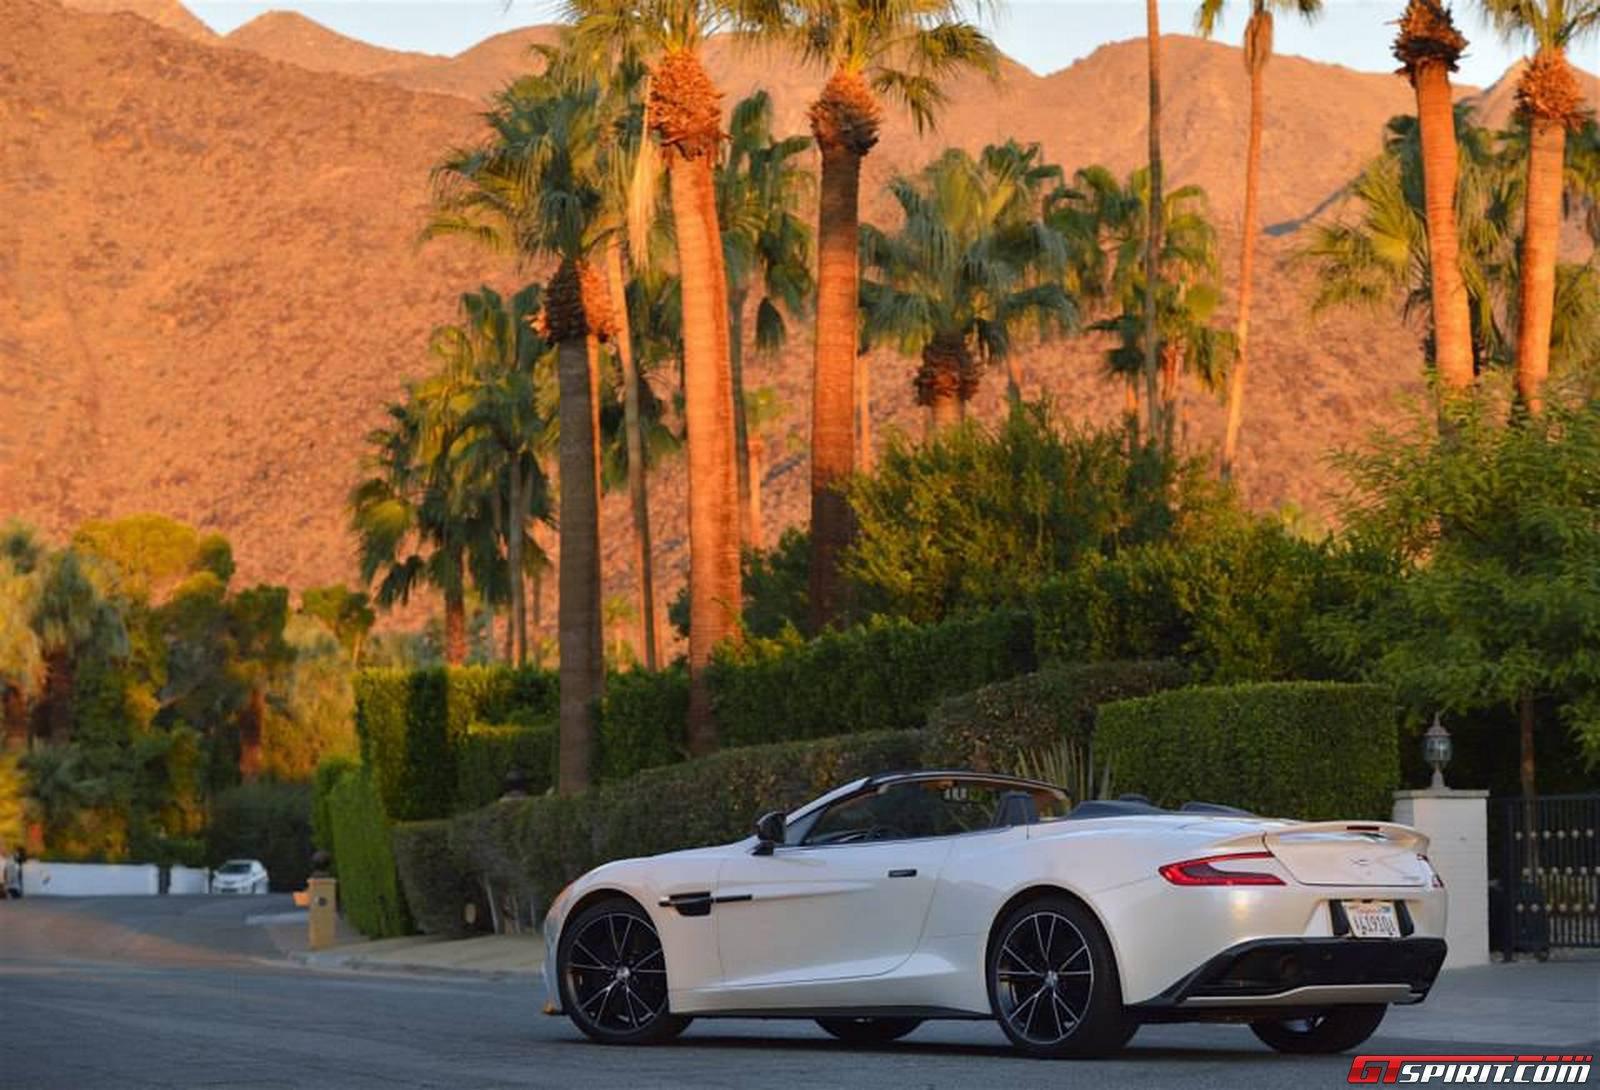 Aston Martin Vanquish Volante In Palm Springs California Gtspirit